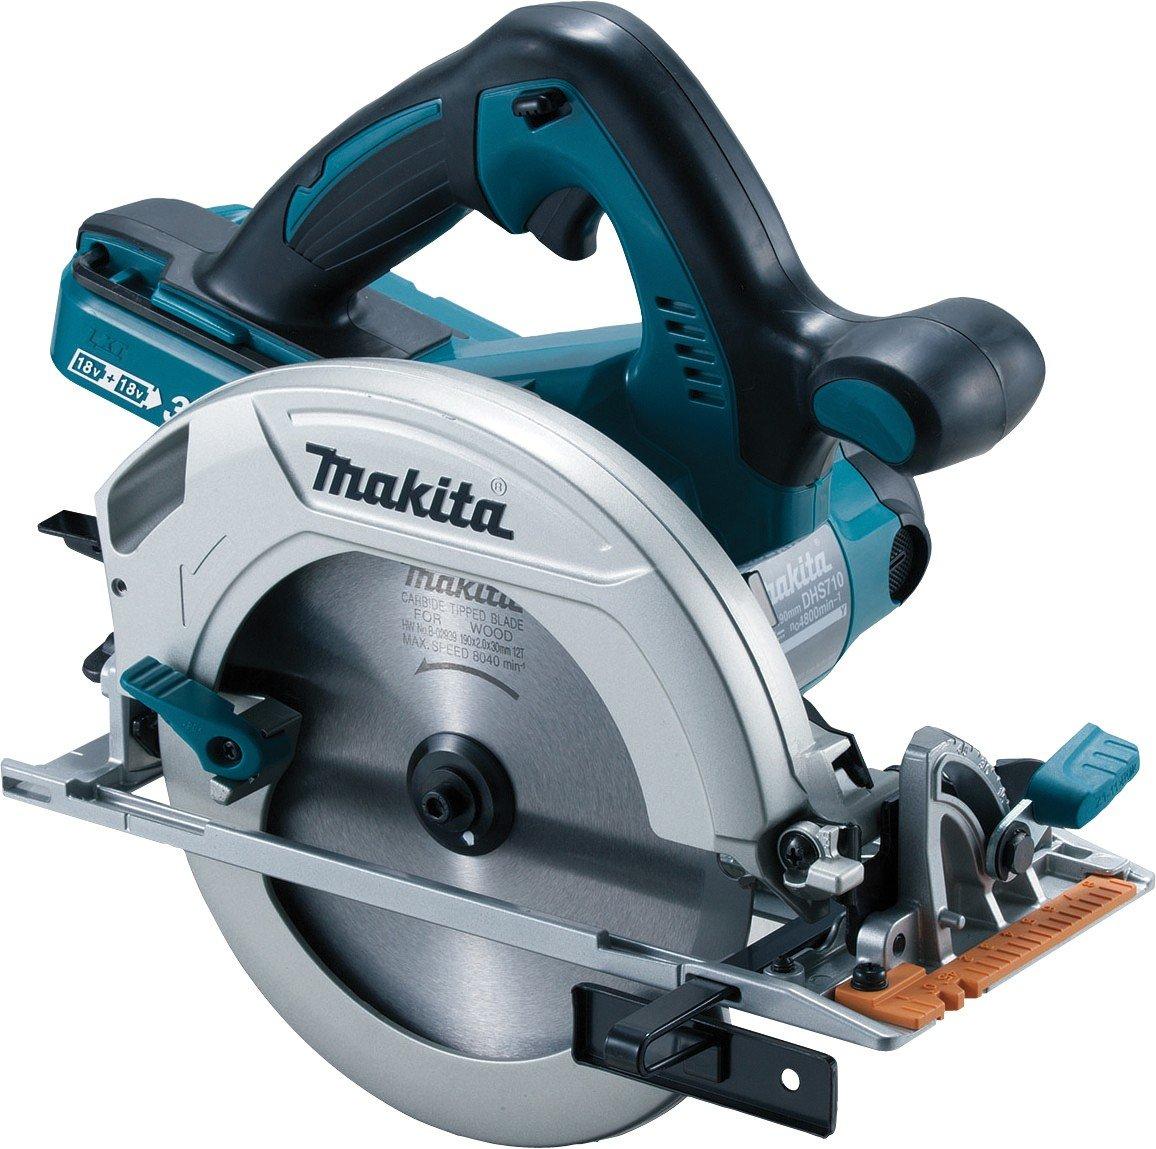 Makita DHS710ZJ Twin 18V 185 mm Circular Saw with MakPac case £143 @ Howe Tools